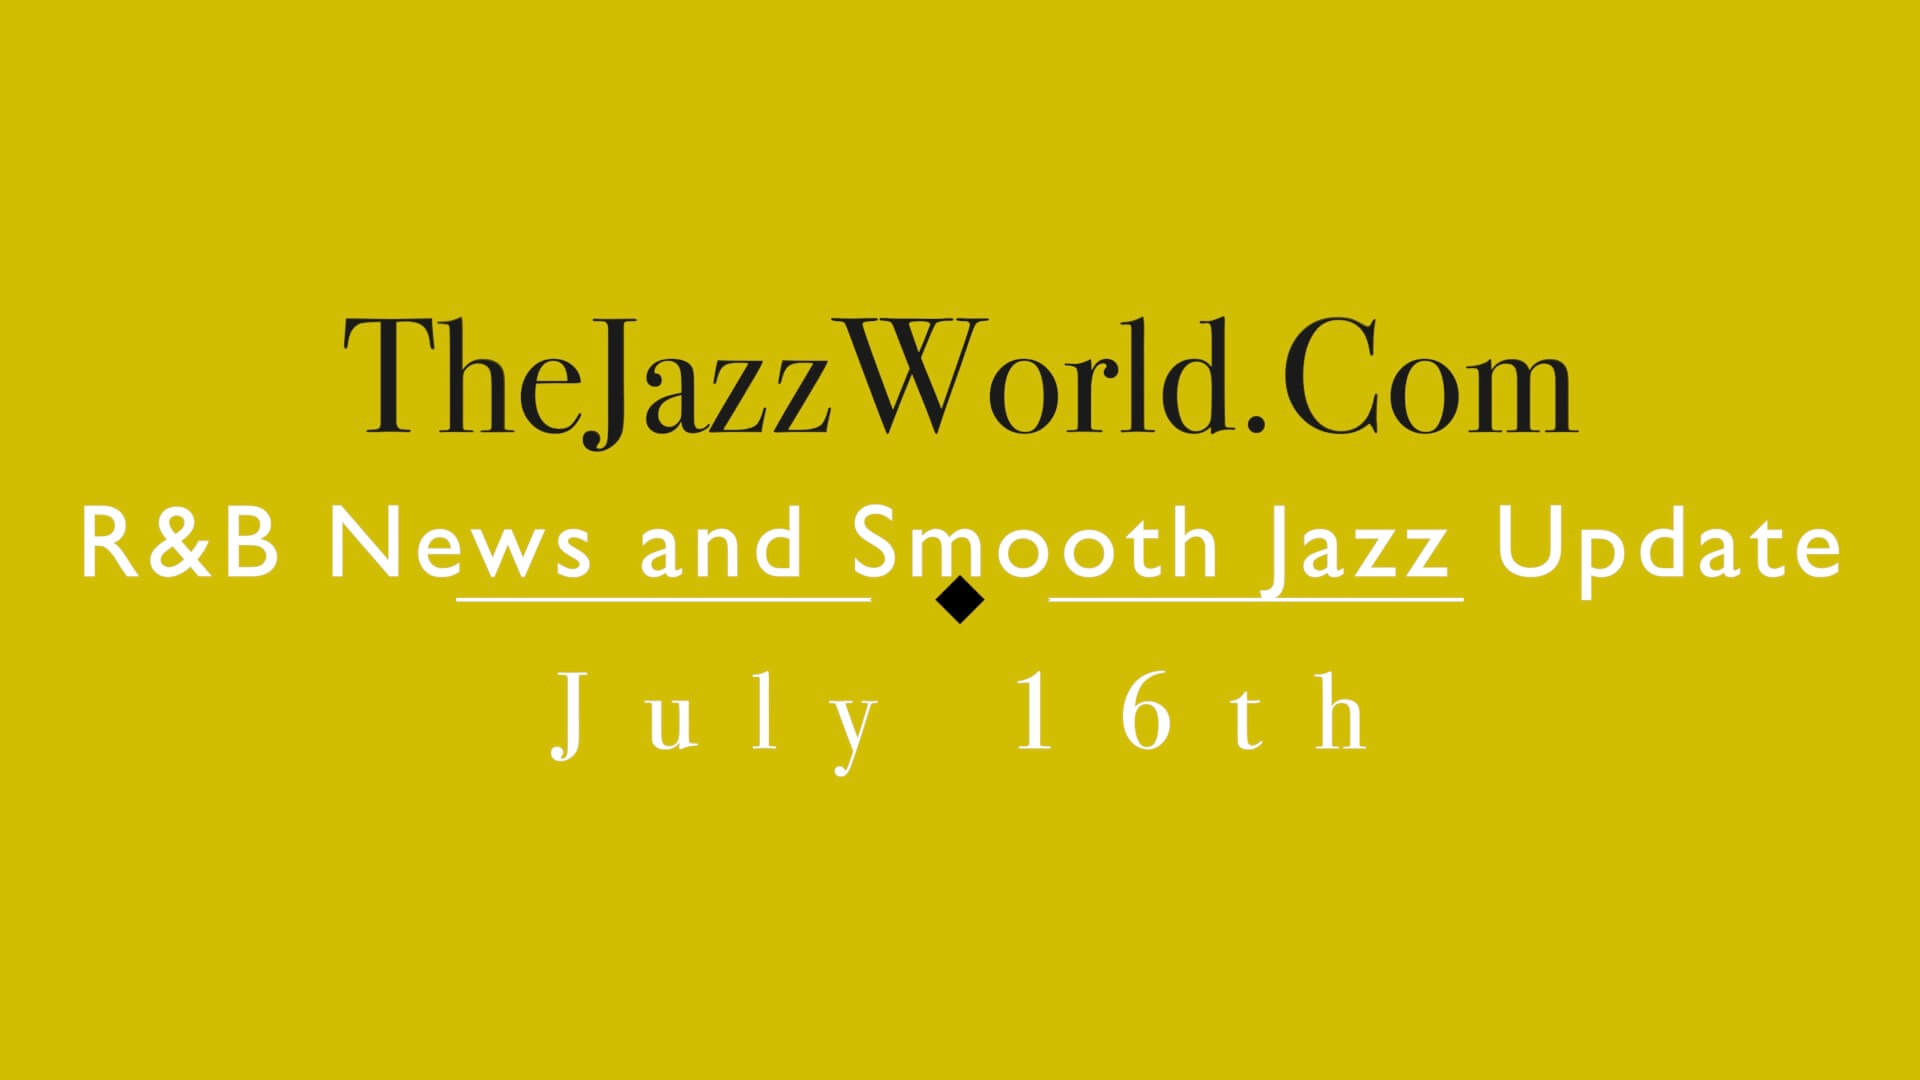 The Jazz World Show 7:16